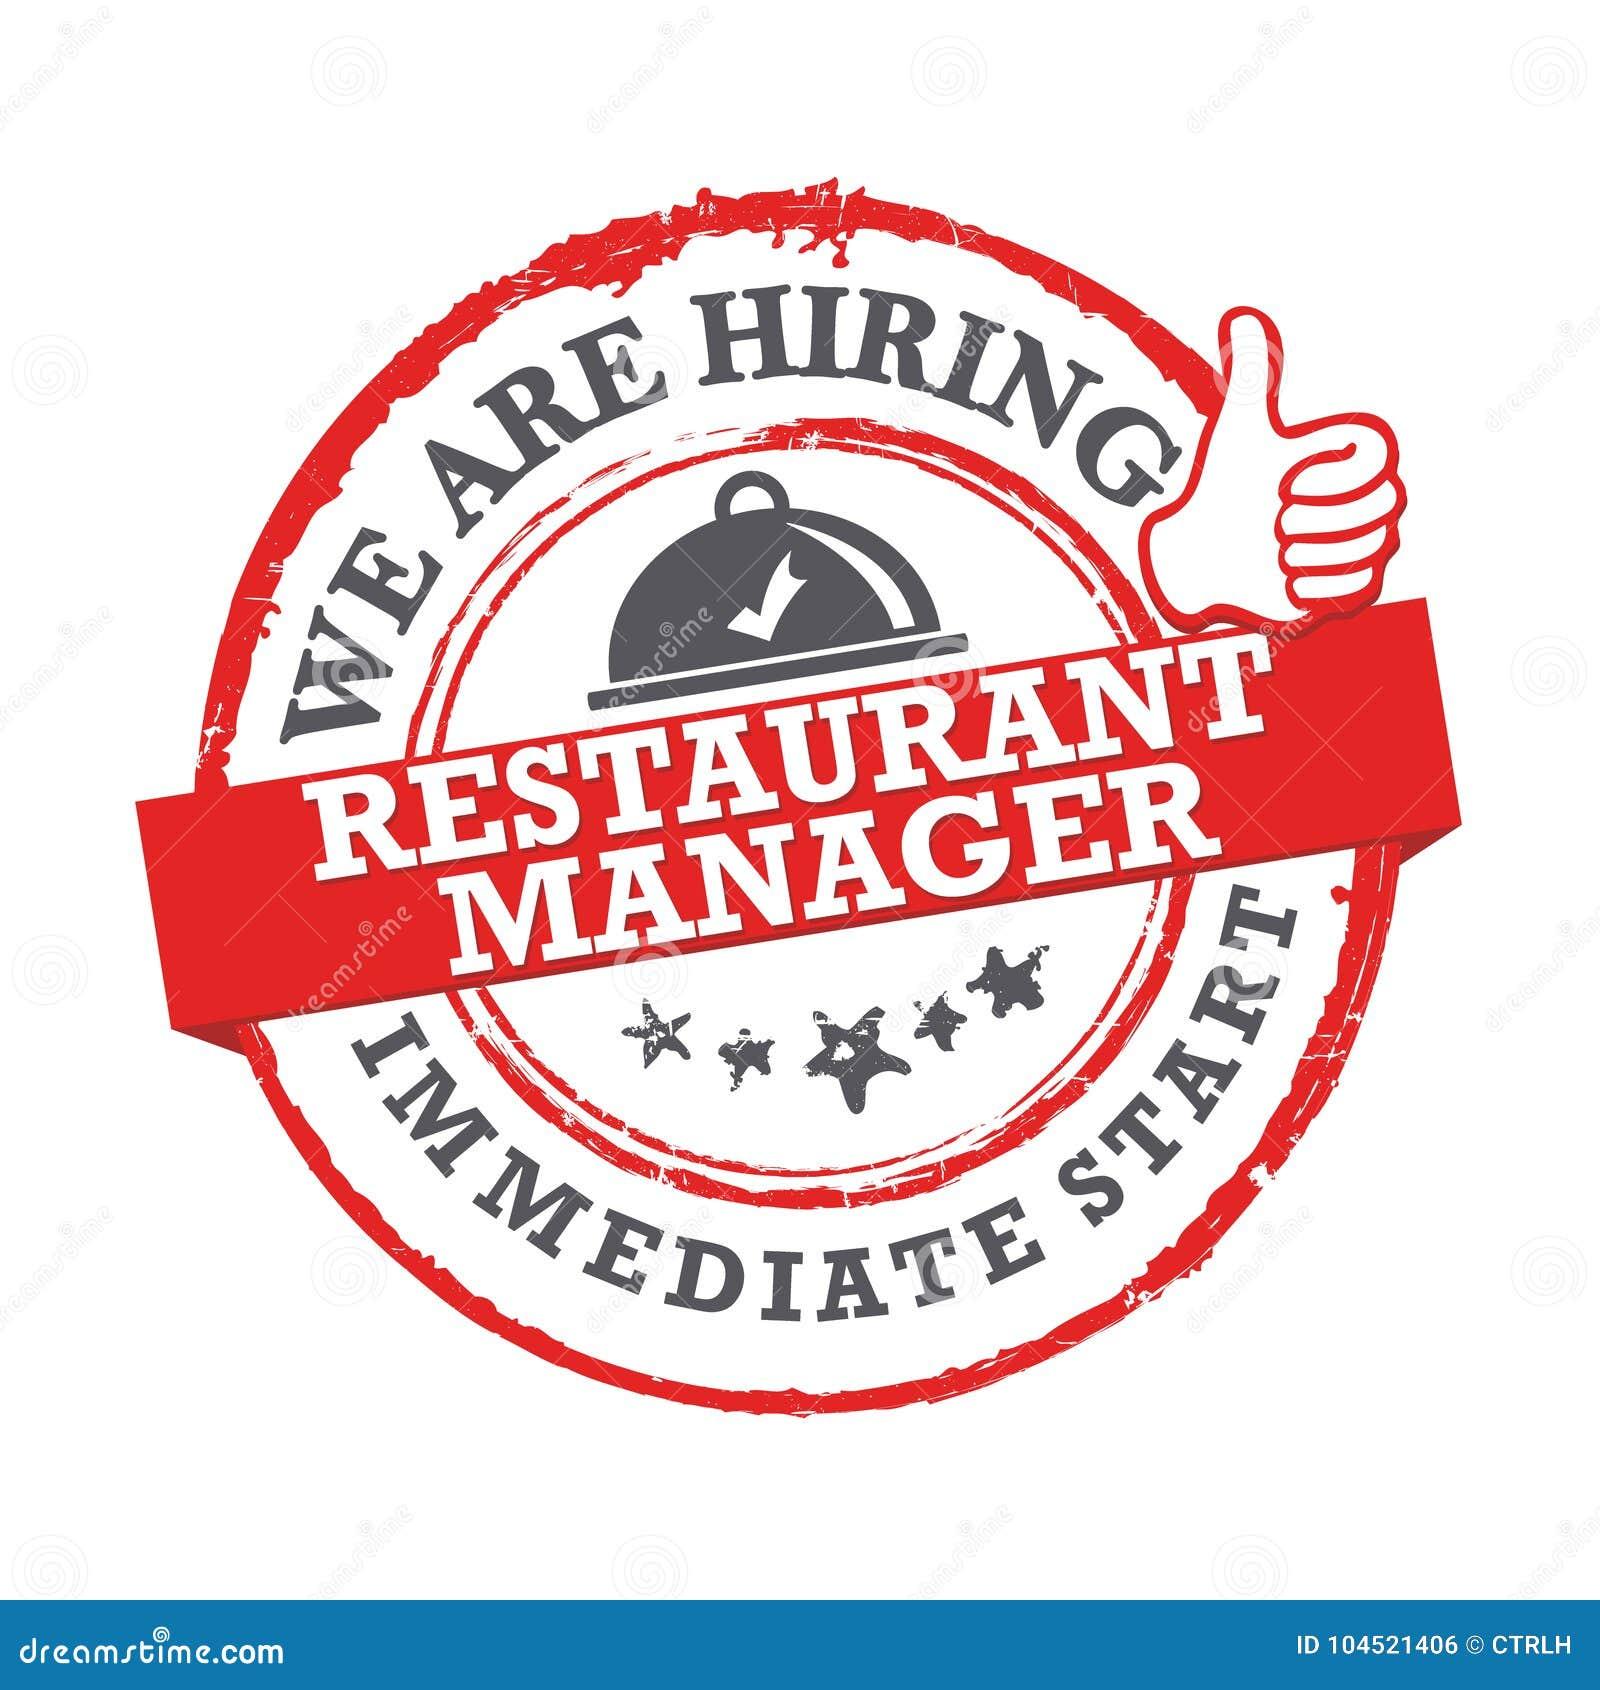 Image result for hiring Restaurant Manager